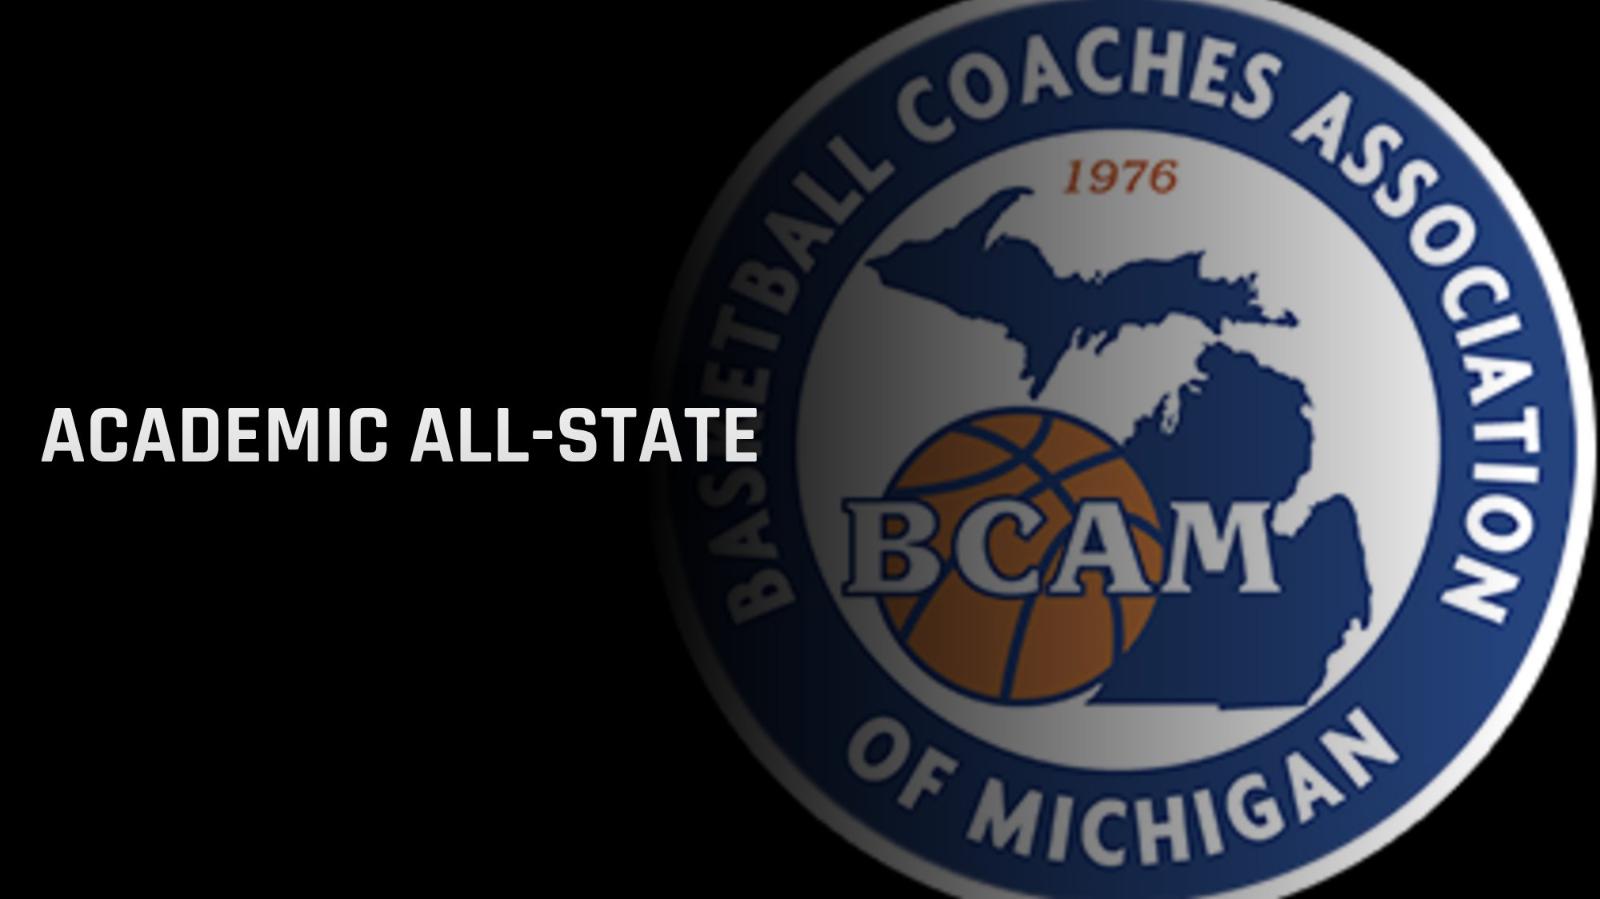 Boys and Girls Basketball Programs Both Named All-State Academic